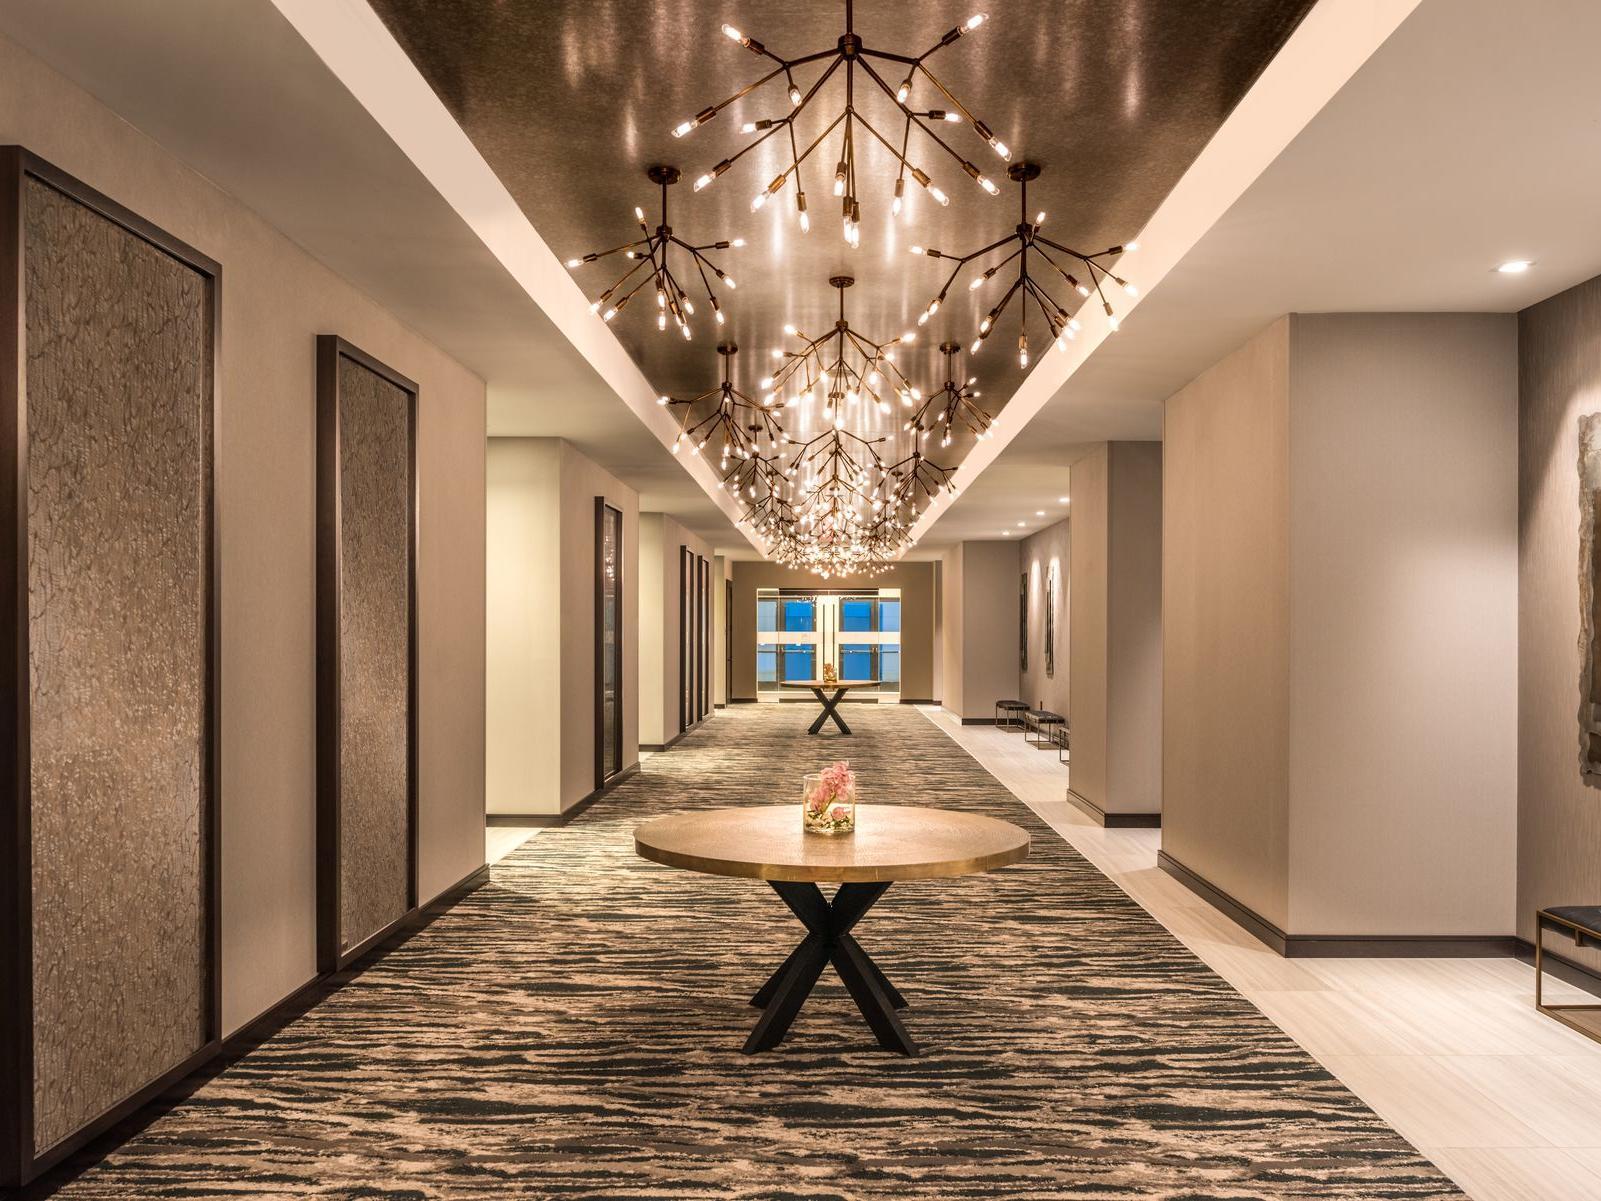 Atrium with decorative light fixtures